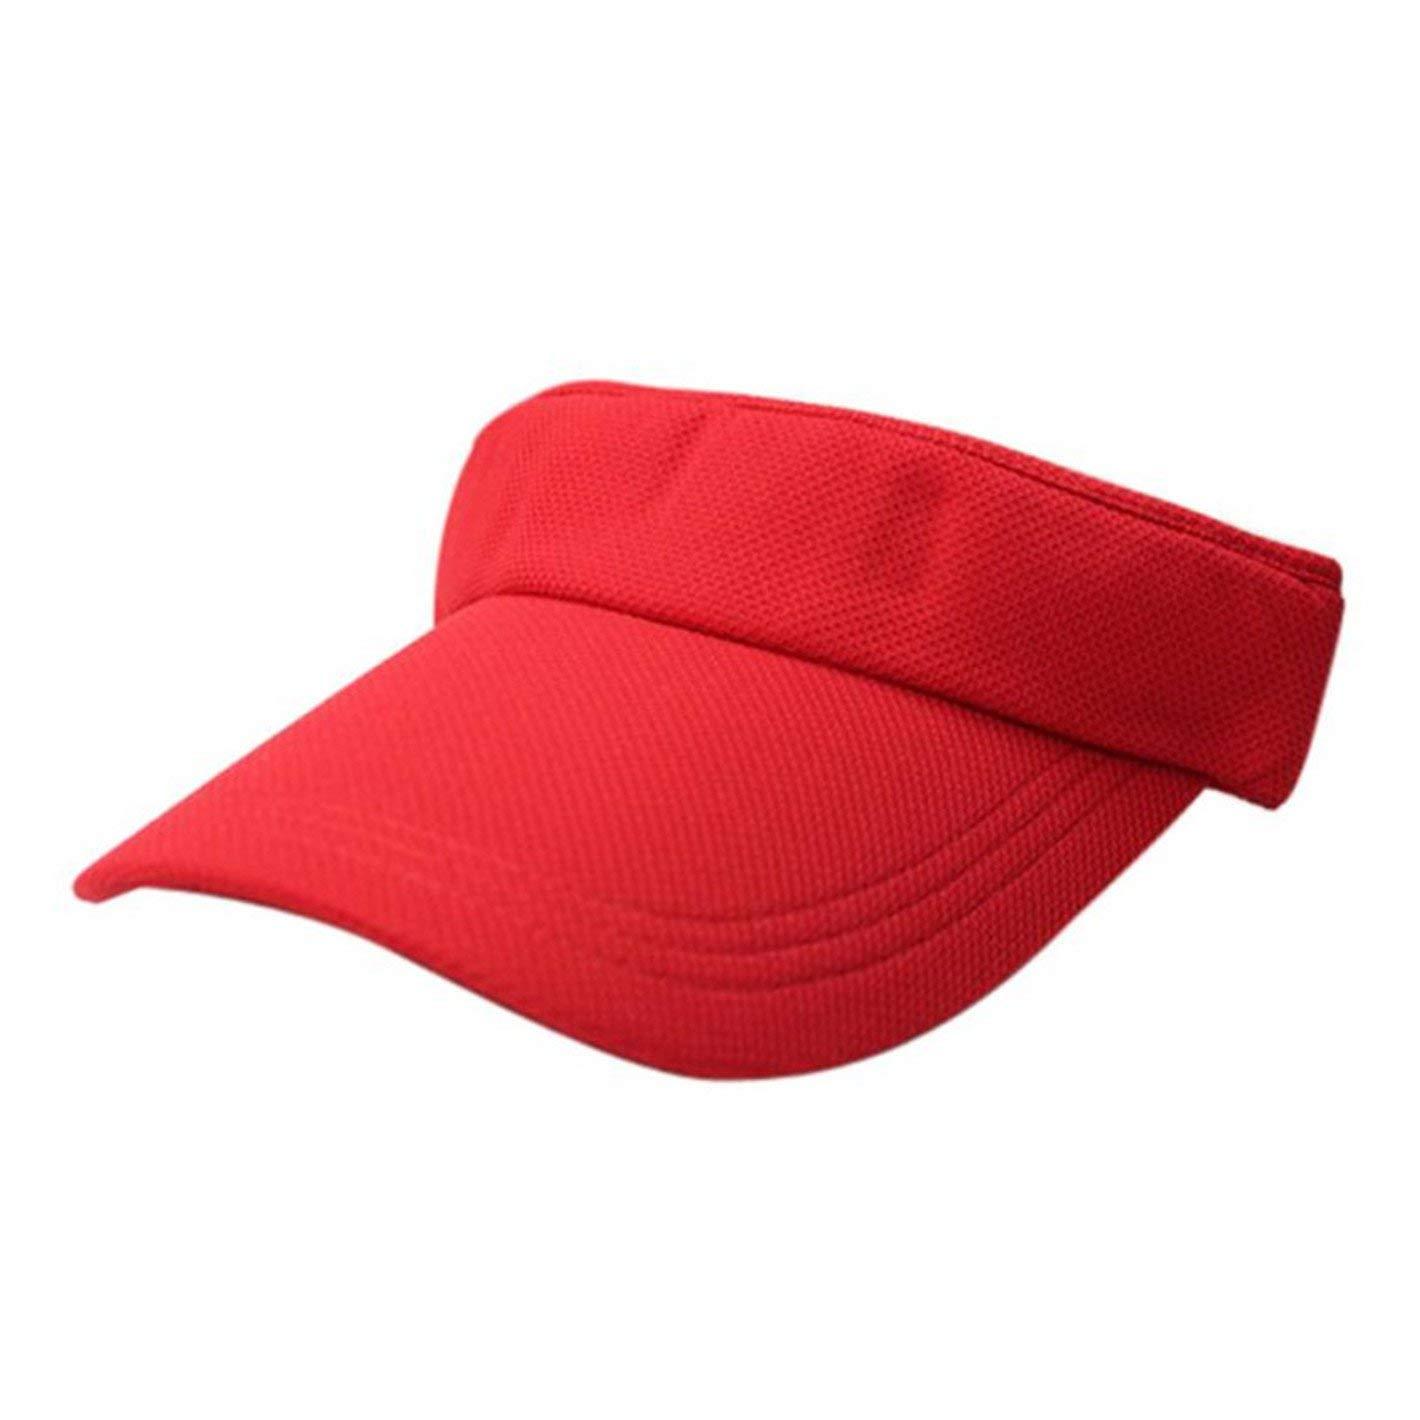 f36c6c4a059 Get Quotations · NEW Men Women s Hats Tennis Caps Snapback Caps Sports Hat  Sunhat Running Hats Outdoor Hat Decc15